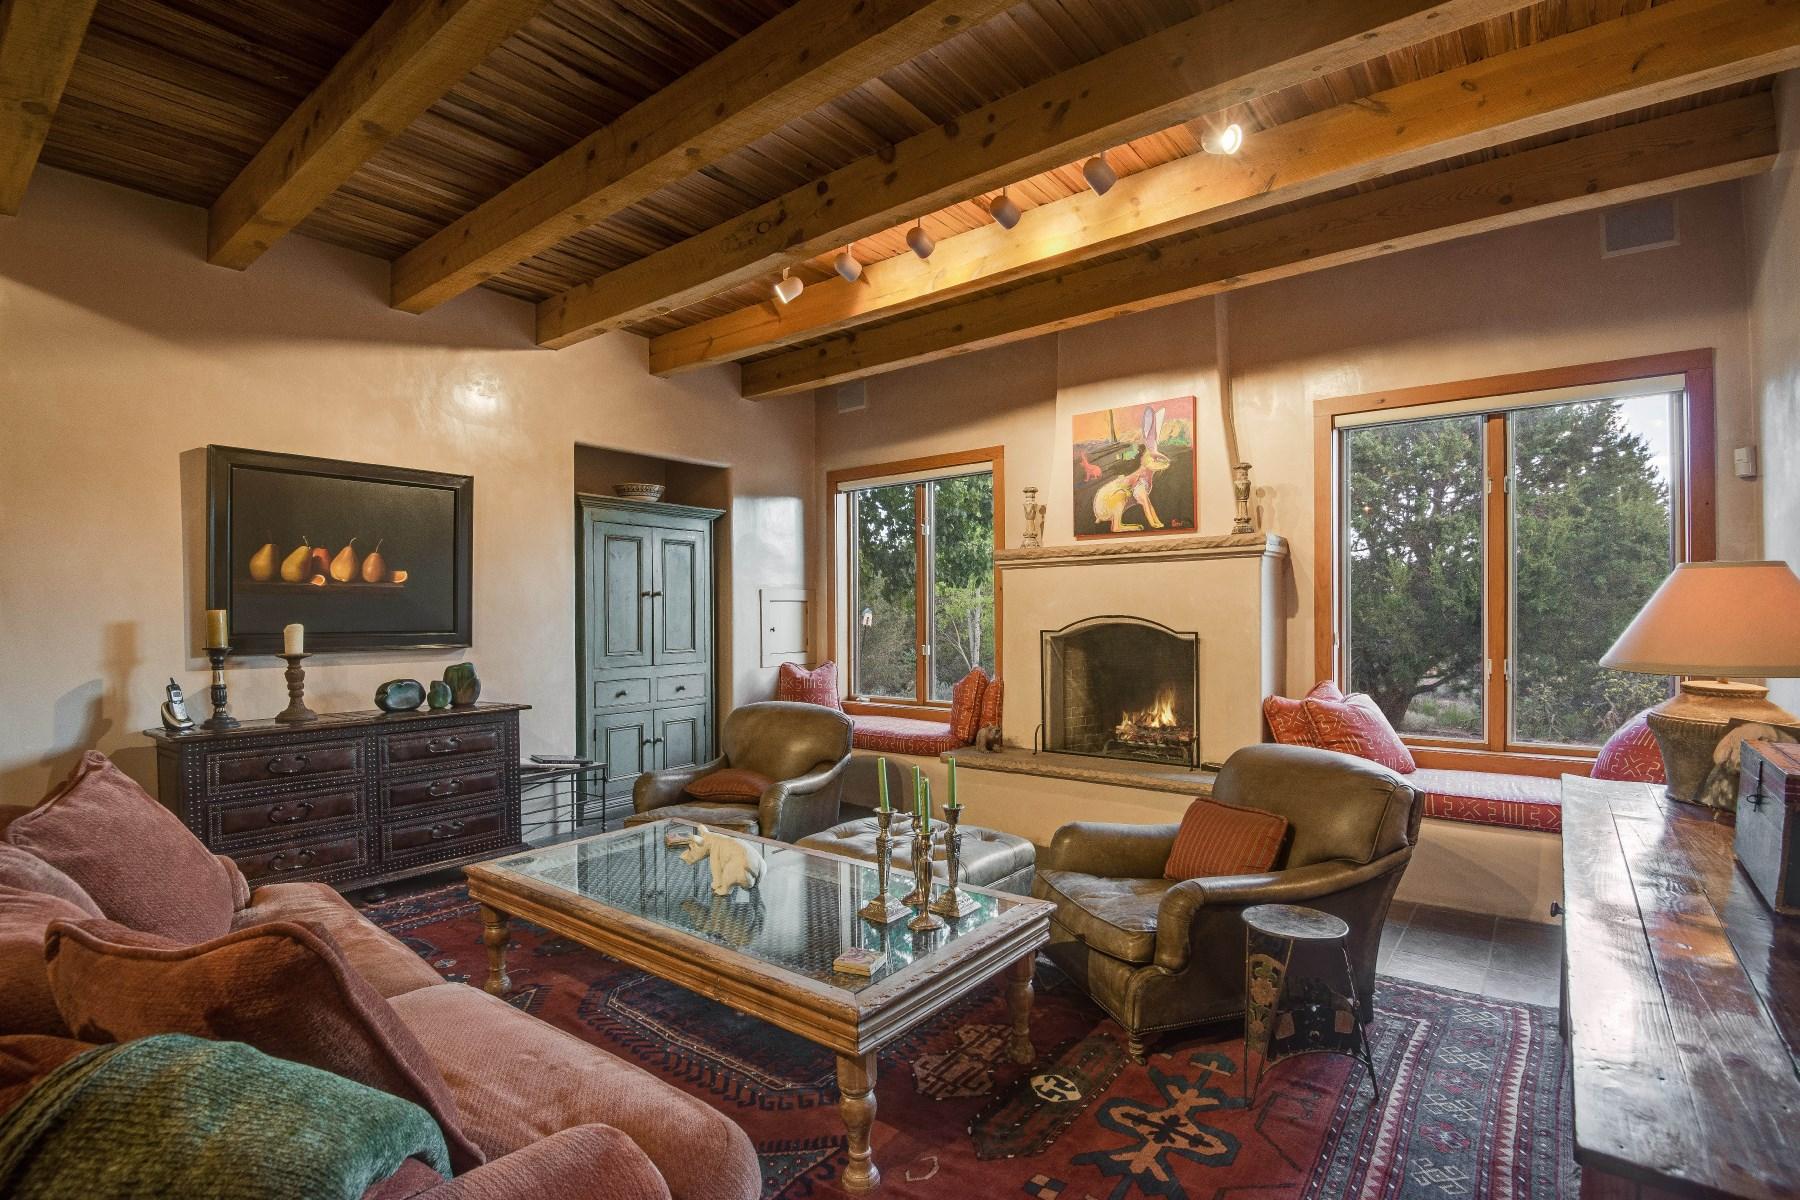 Single Family Home for Sale at 2020 Calle Lejano Santa Fe City Northeast, Santa Fe, New Mexico, 87501 United States